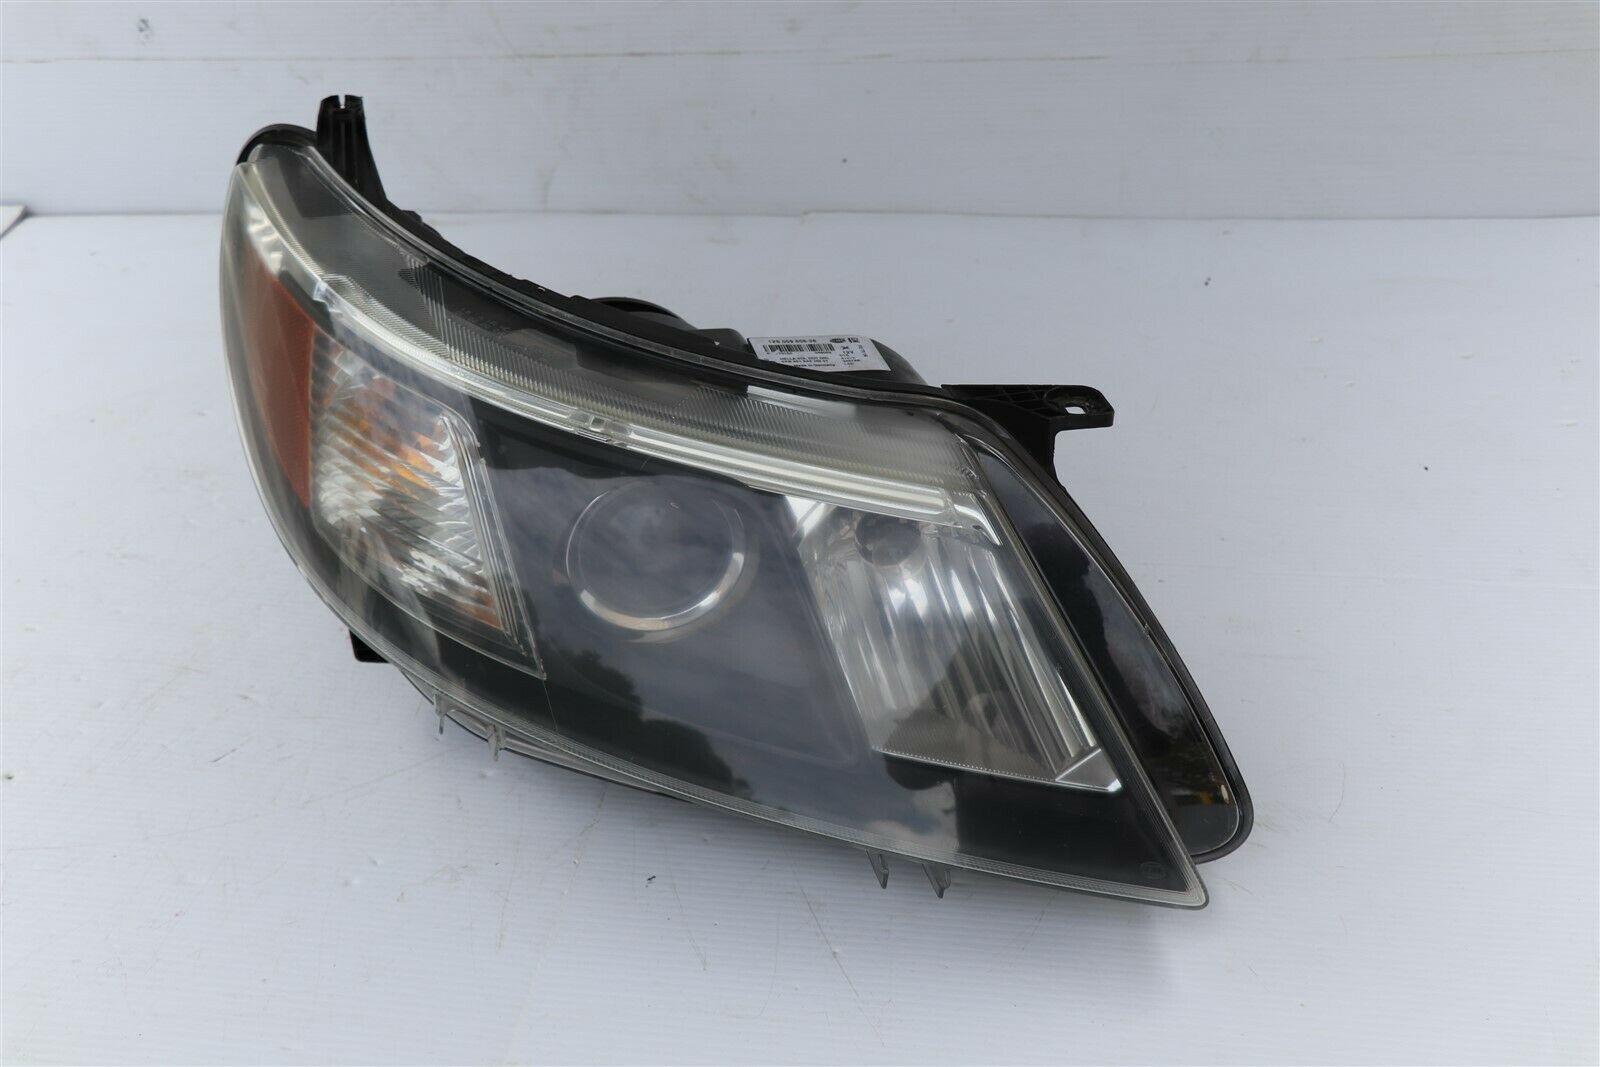 08-11 Saab 9/3 9-3 93 Headlight Head Light Lamp Xenon HID AFS Passengr Right RH